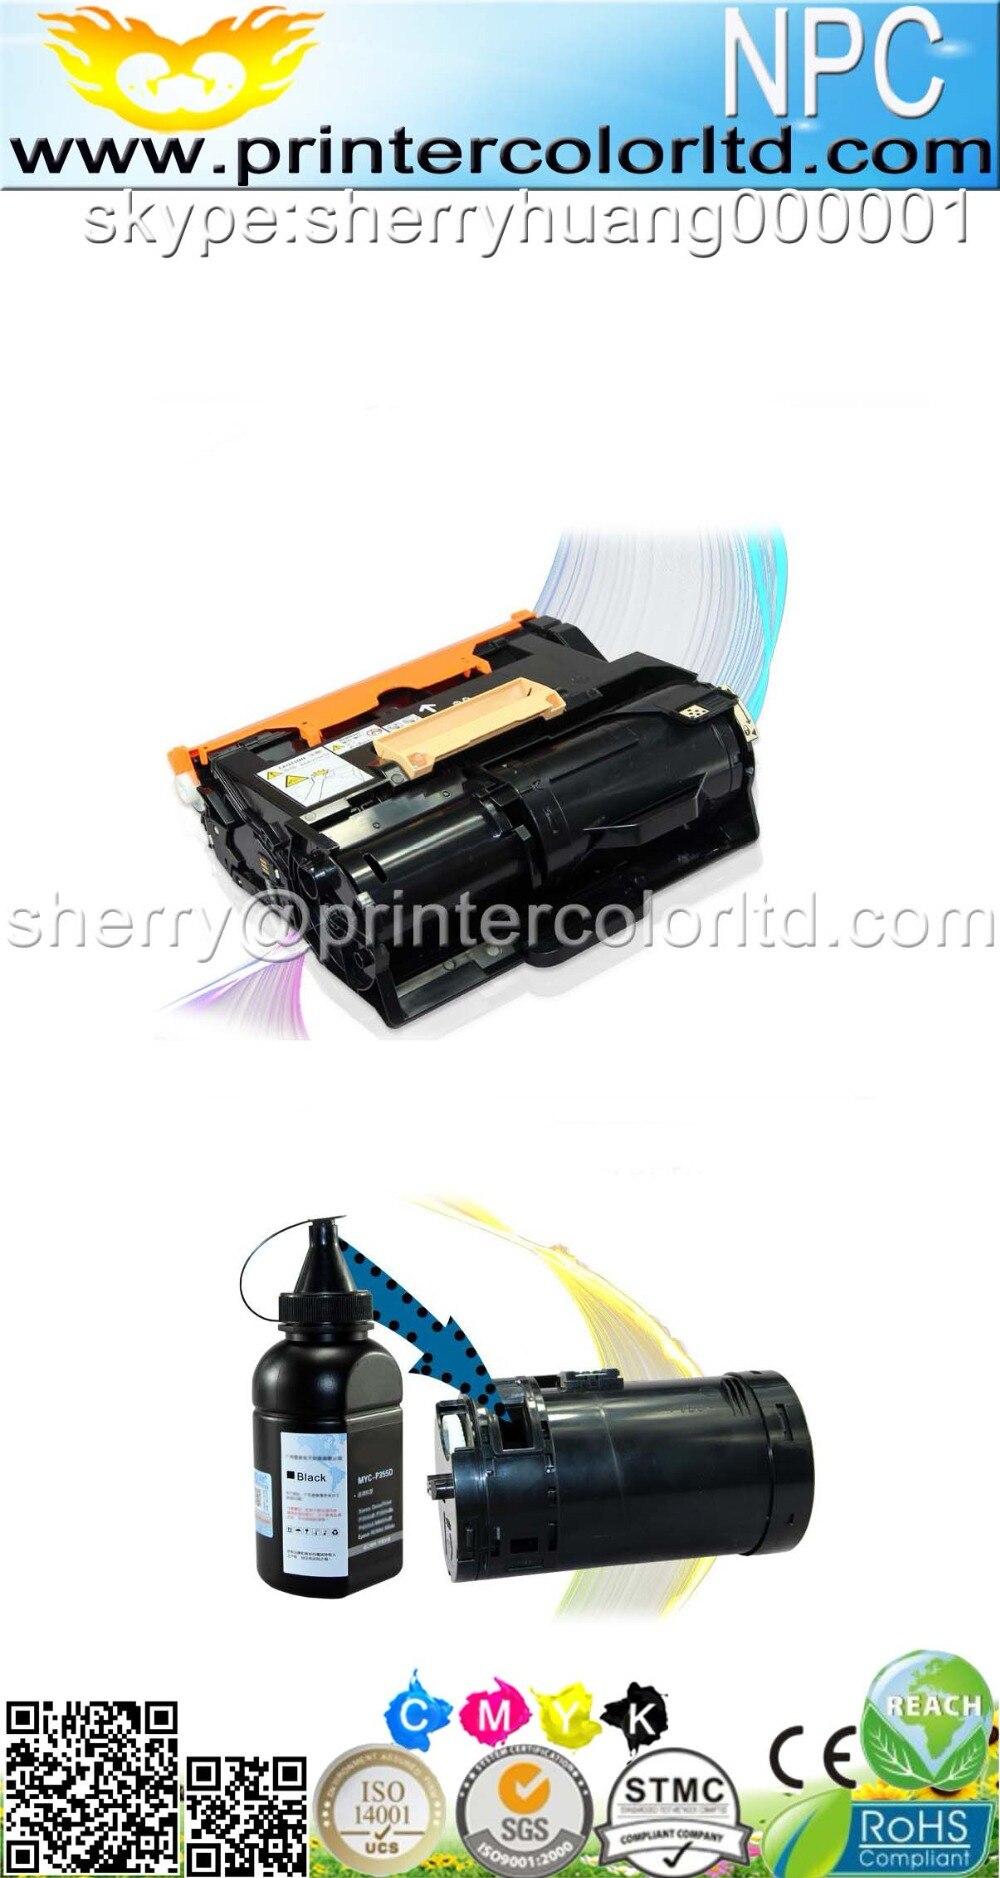 1KG Bag toner powder refill For Xerox Phaser 3610/3610DN/3610N/WorkCentre  WC 3615/3615DN/106R02721 106R02722 106R02723 106R02724